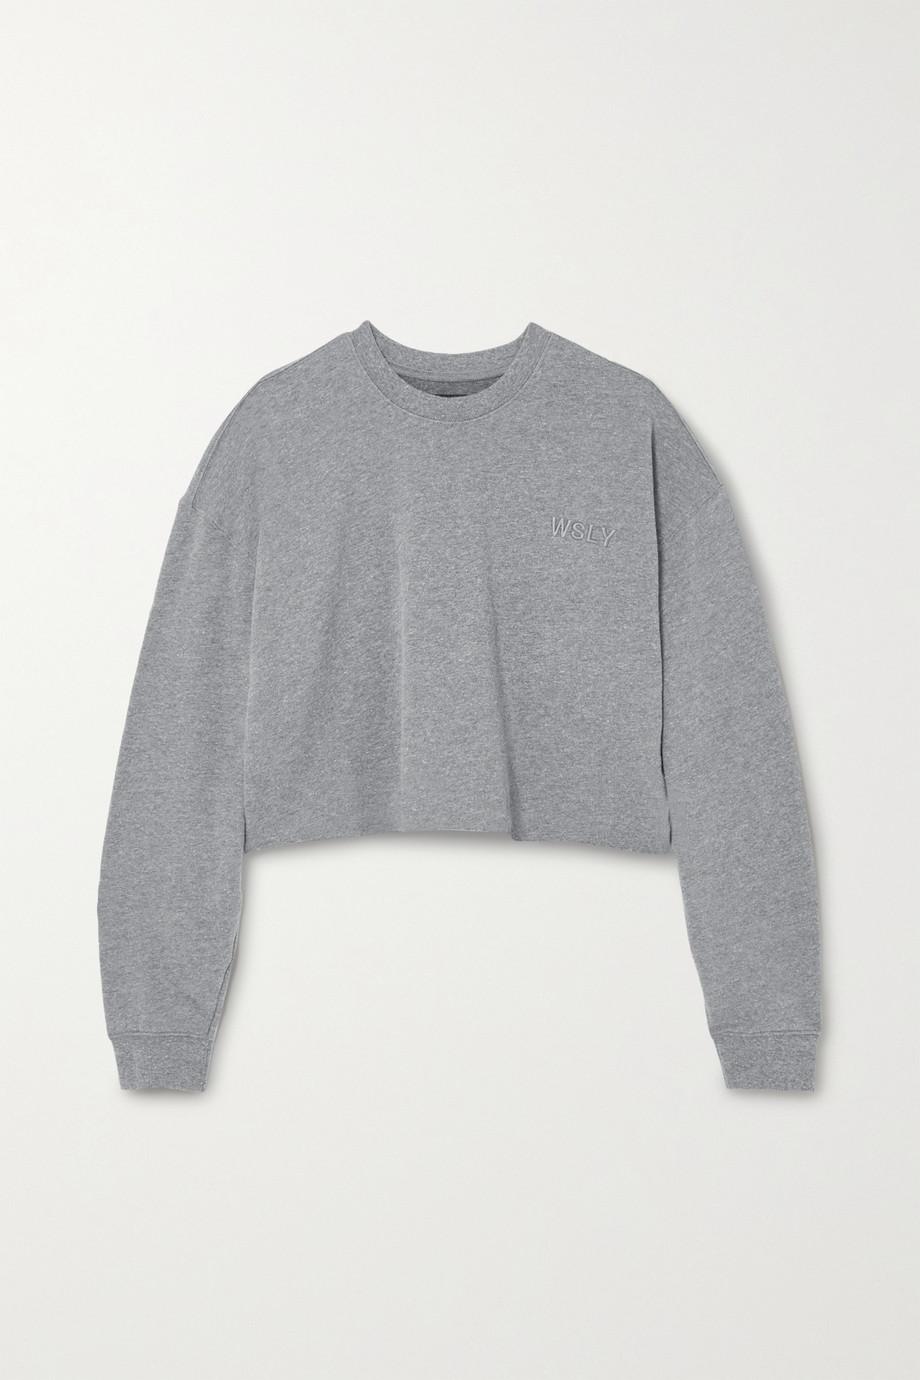 WSLY The Ecosoft cropped organic cotton-blend jersey sweatshirt